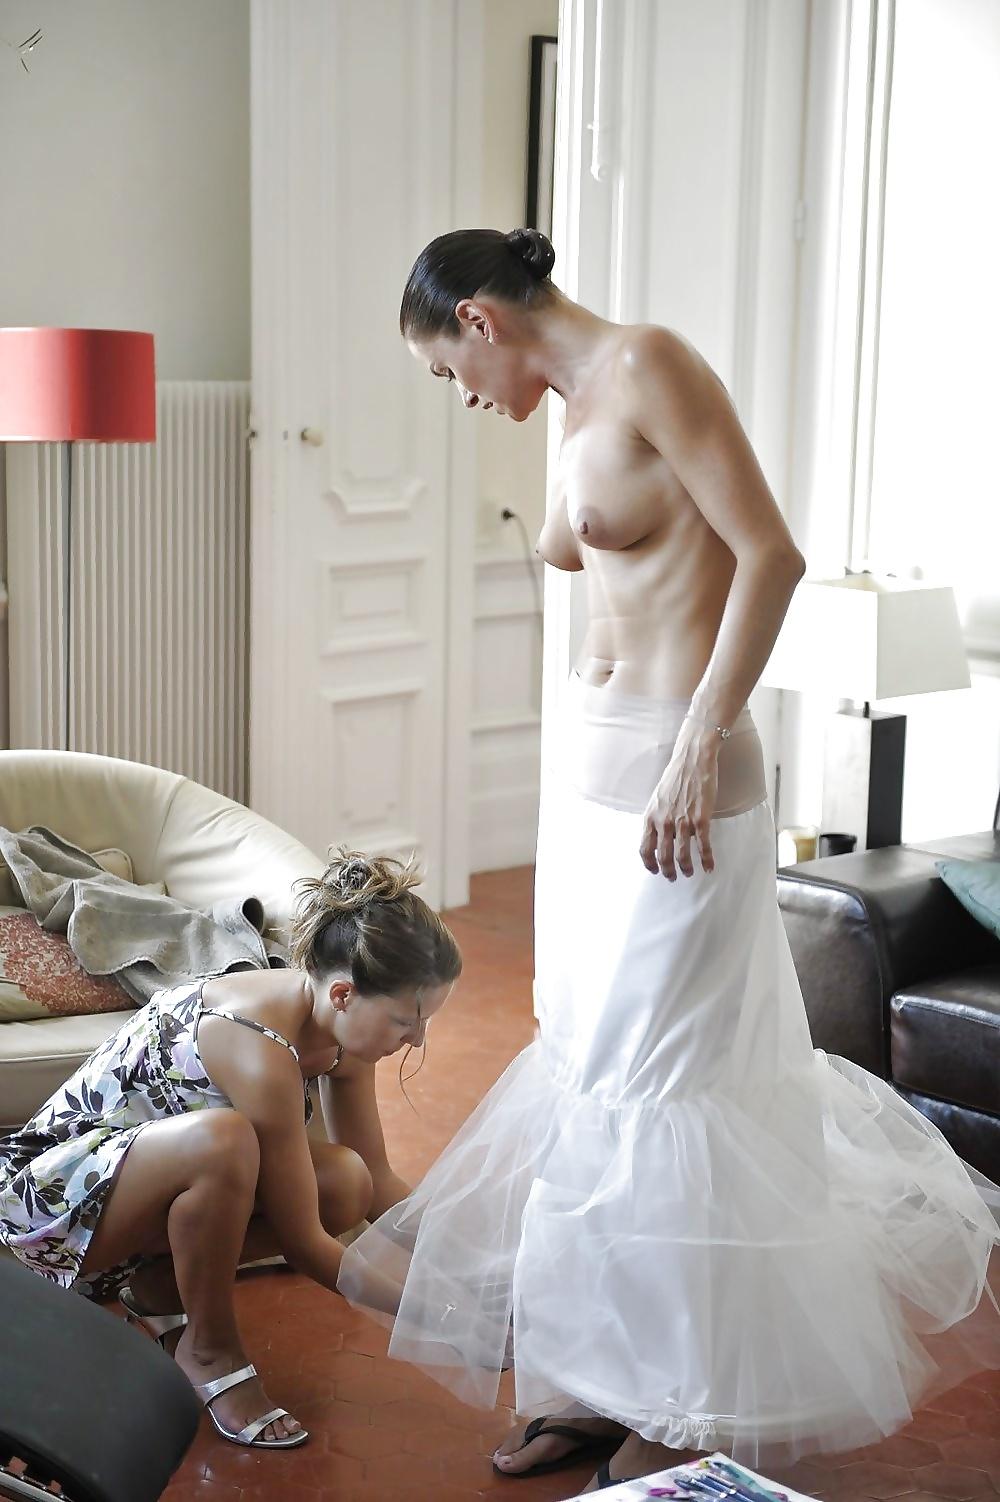 Wedding sex pics nude, nude bengali girls